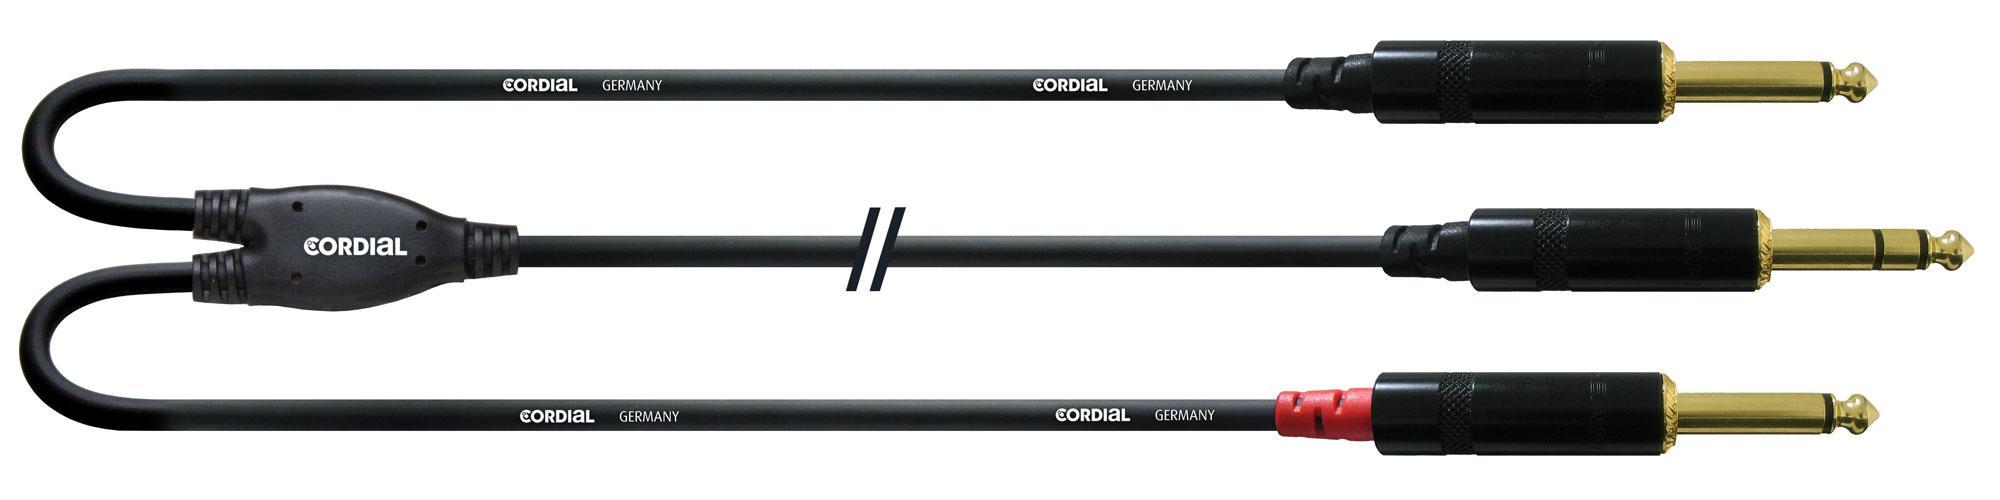 Kabelmulticores - Cordial CFY 3 VPP Insertkabel 3 m - Onlineshop Musikhaus Kirstein